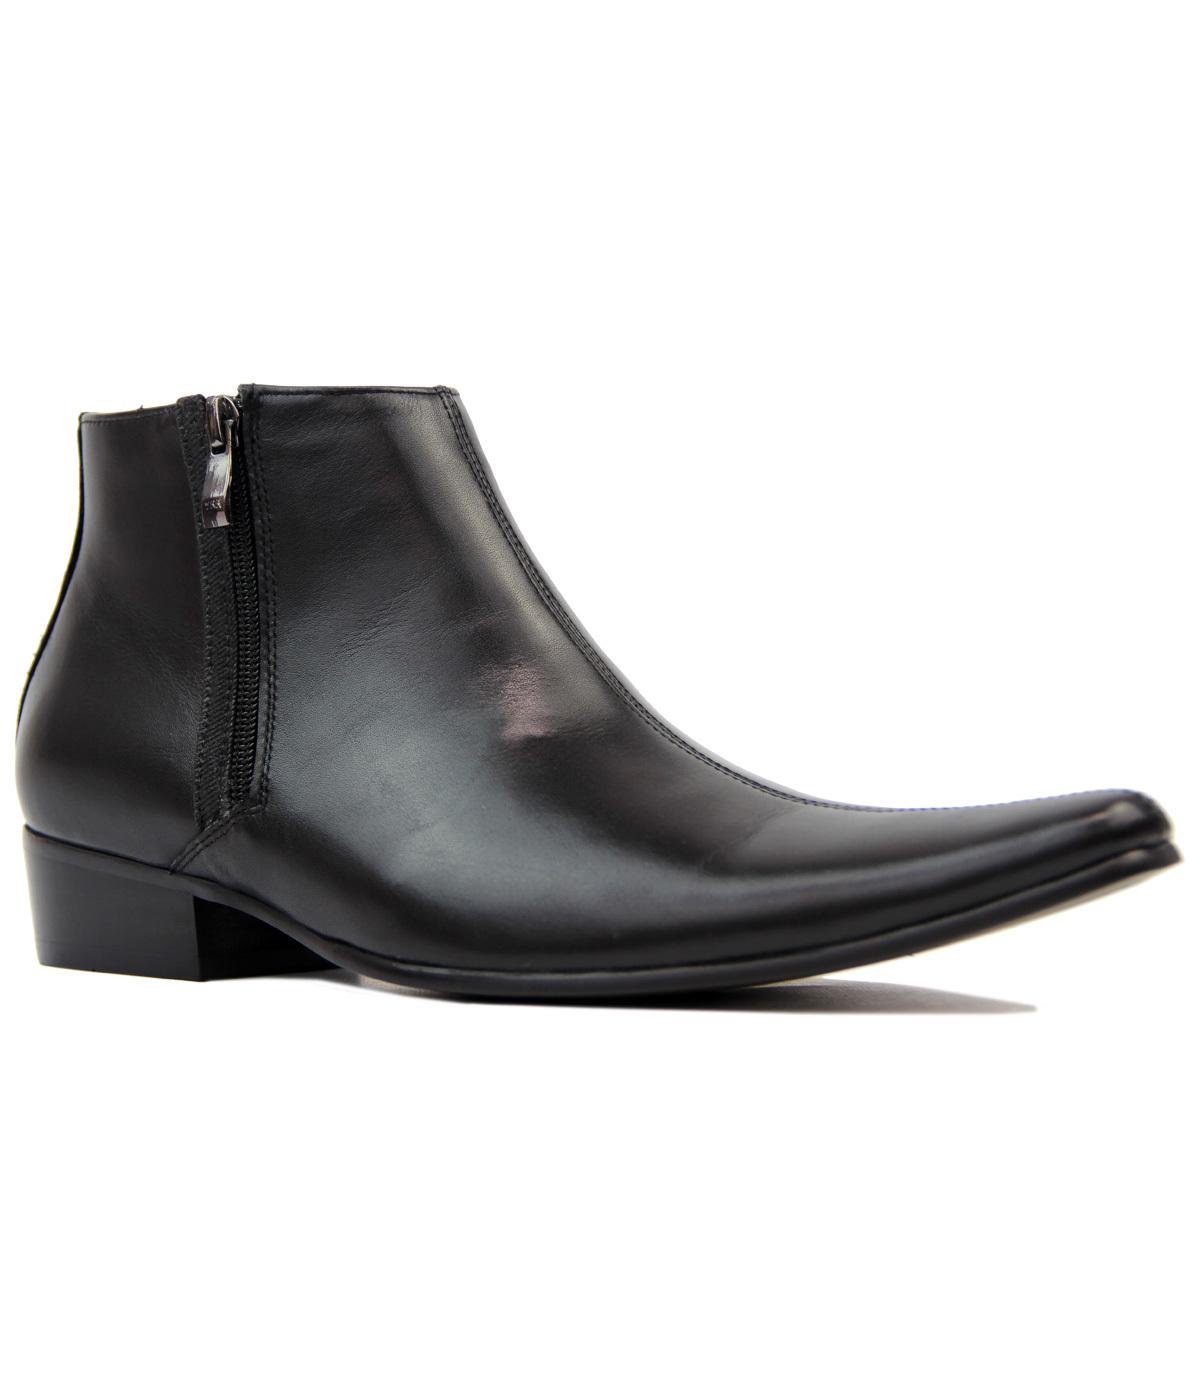 Thunderbolt MADCAP Chisel Toe Chelsea Boots (BL)